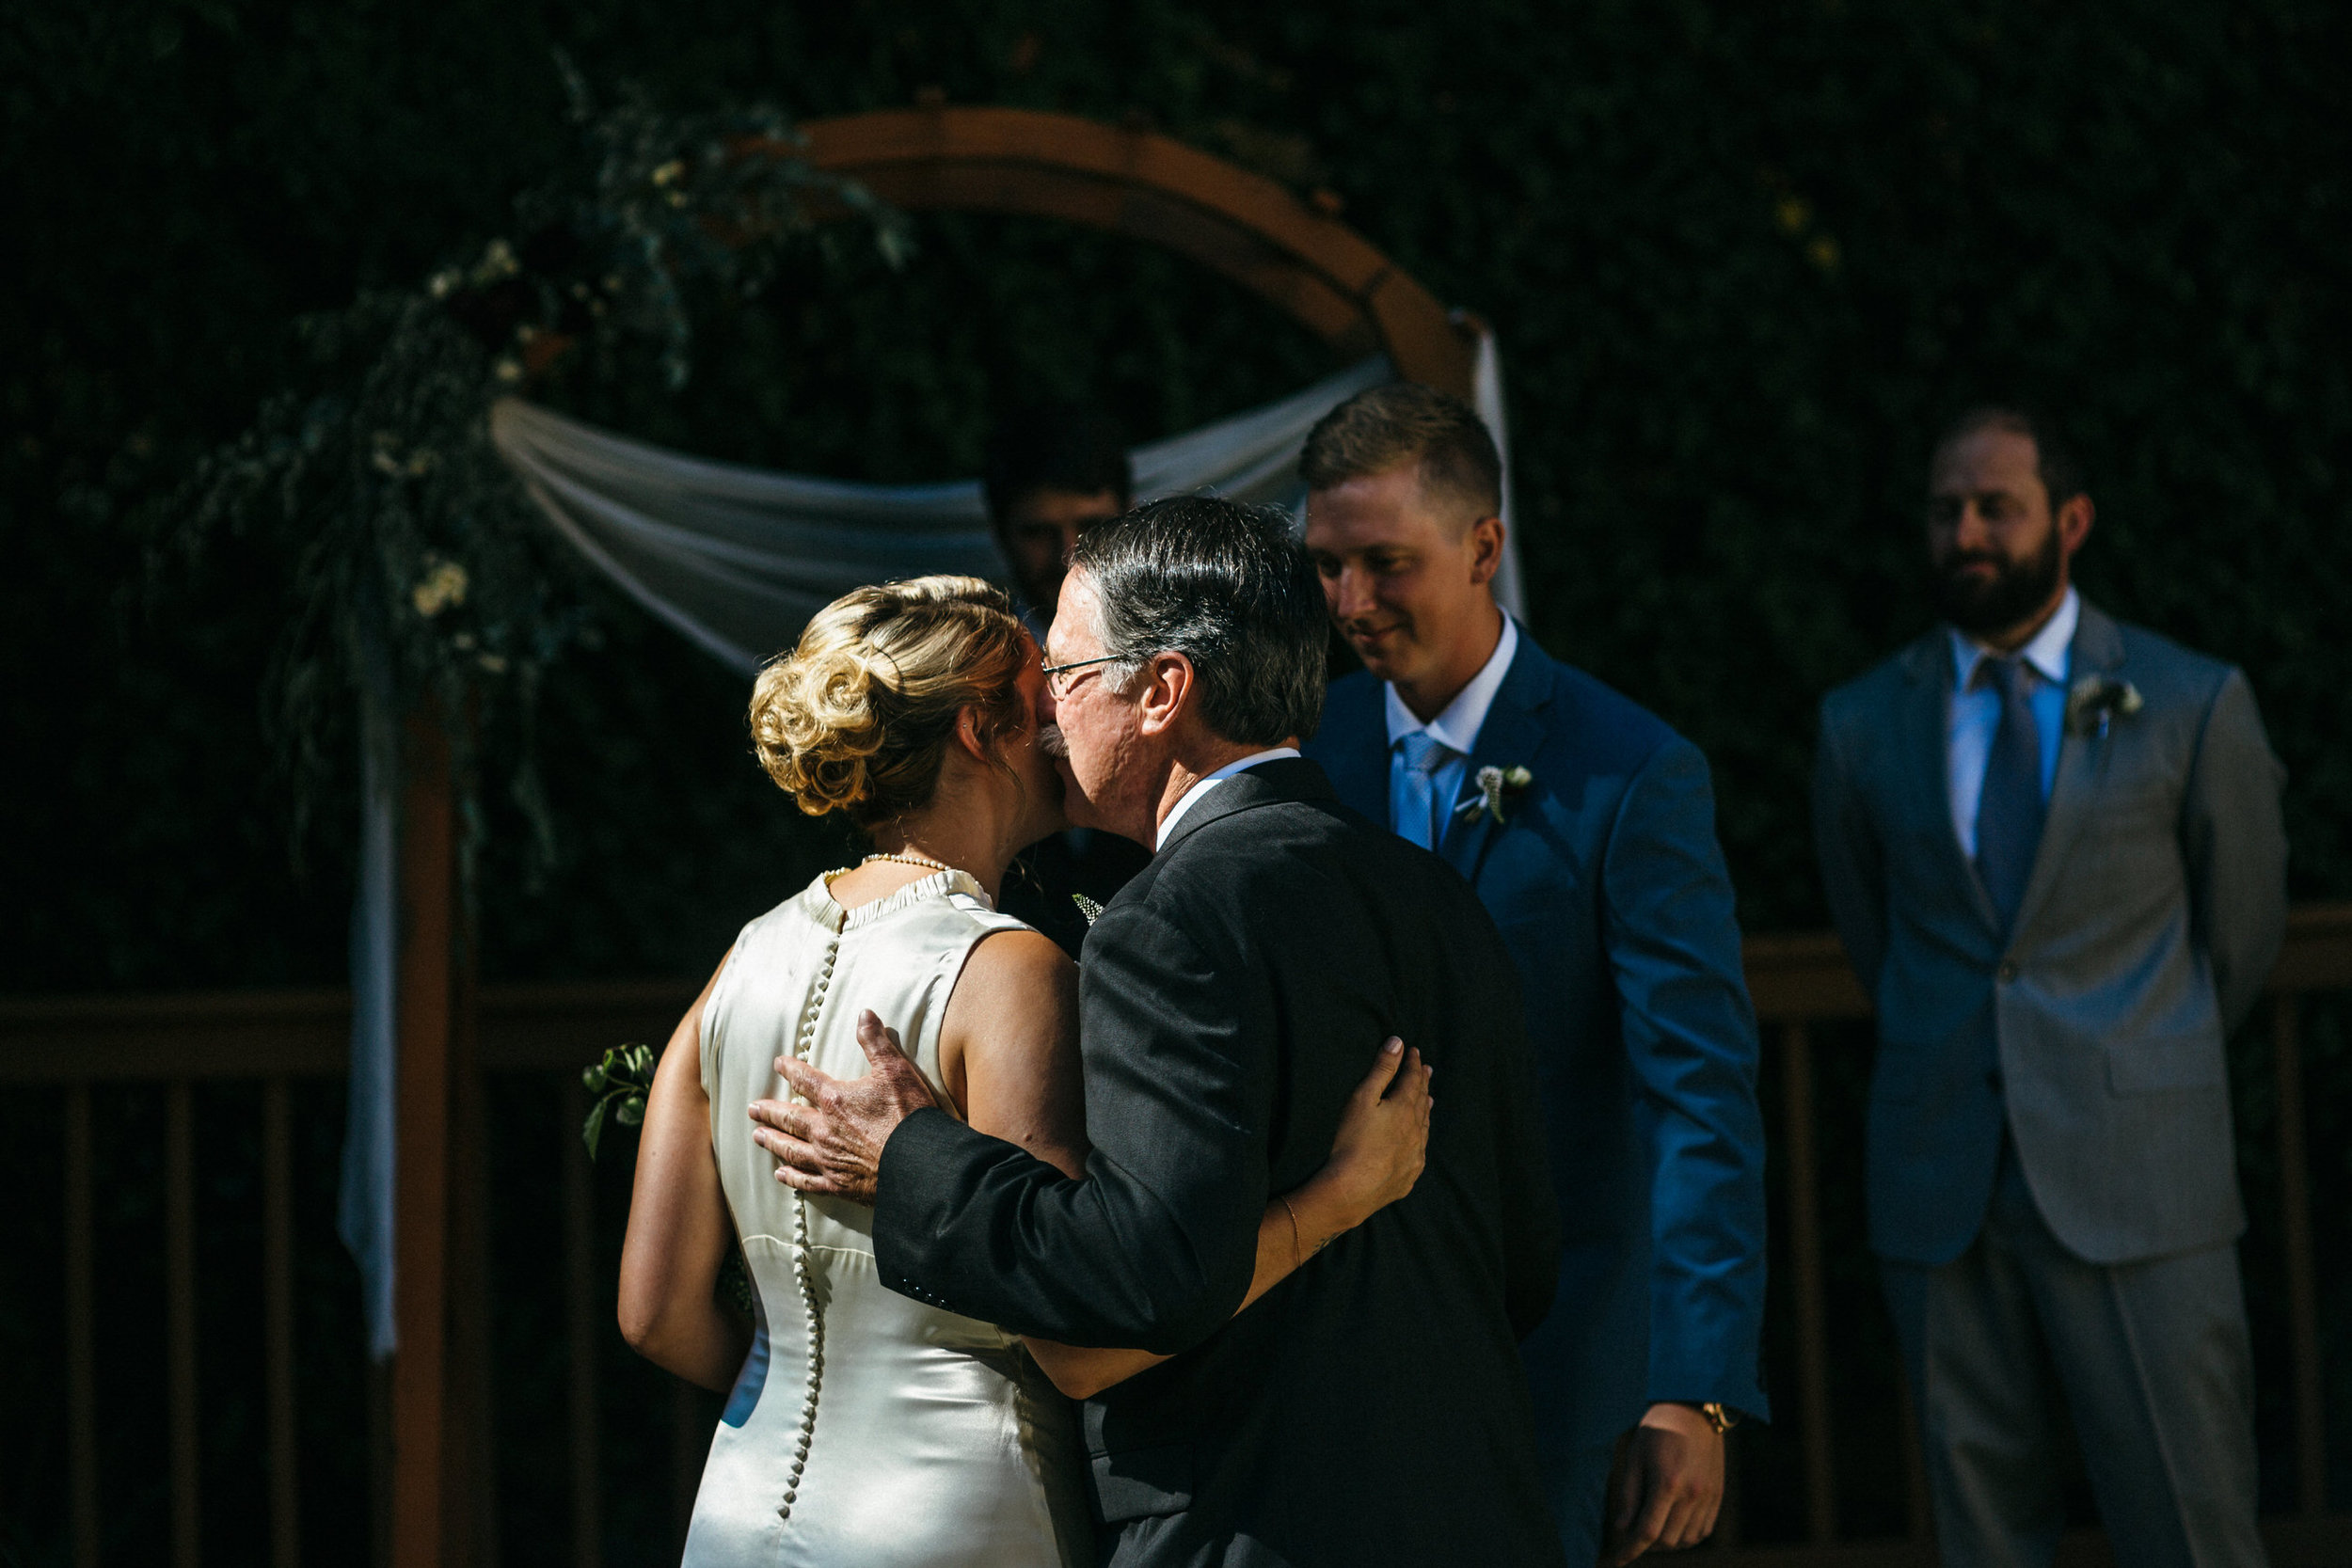 Laurelhurst Park club wedding photographer Portand pdx Oregon052.JPG